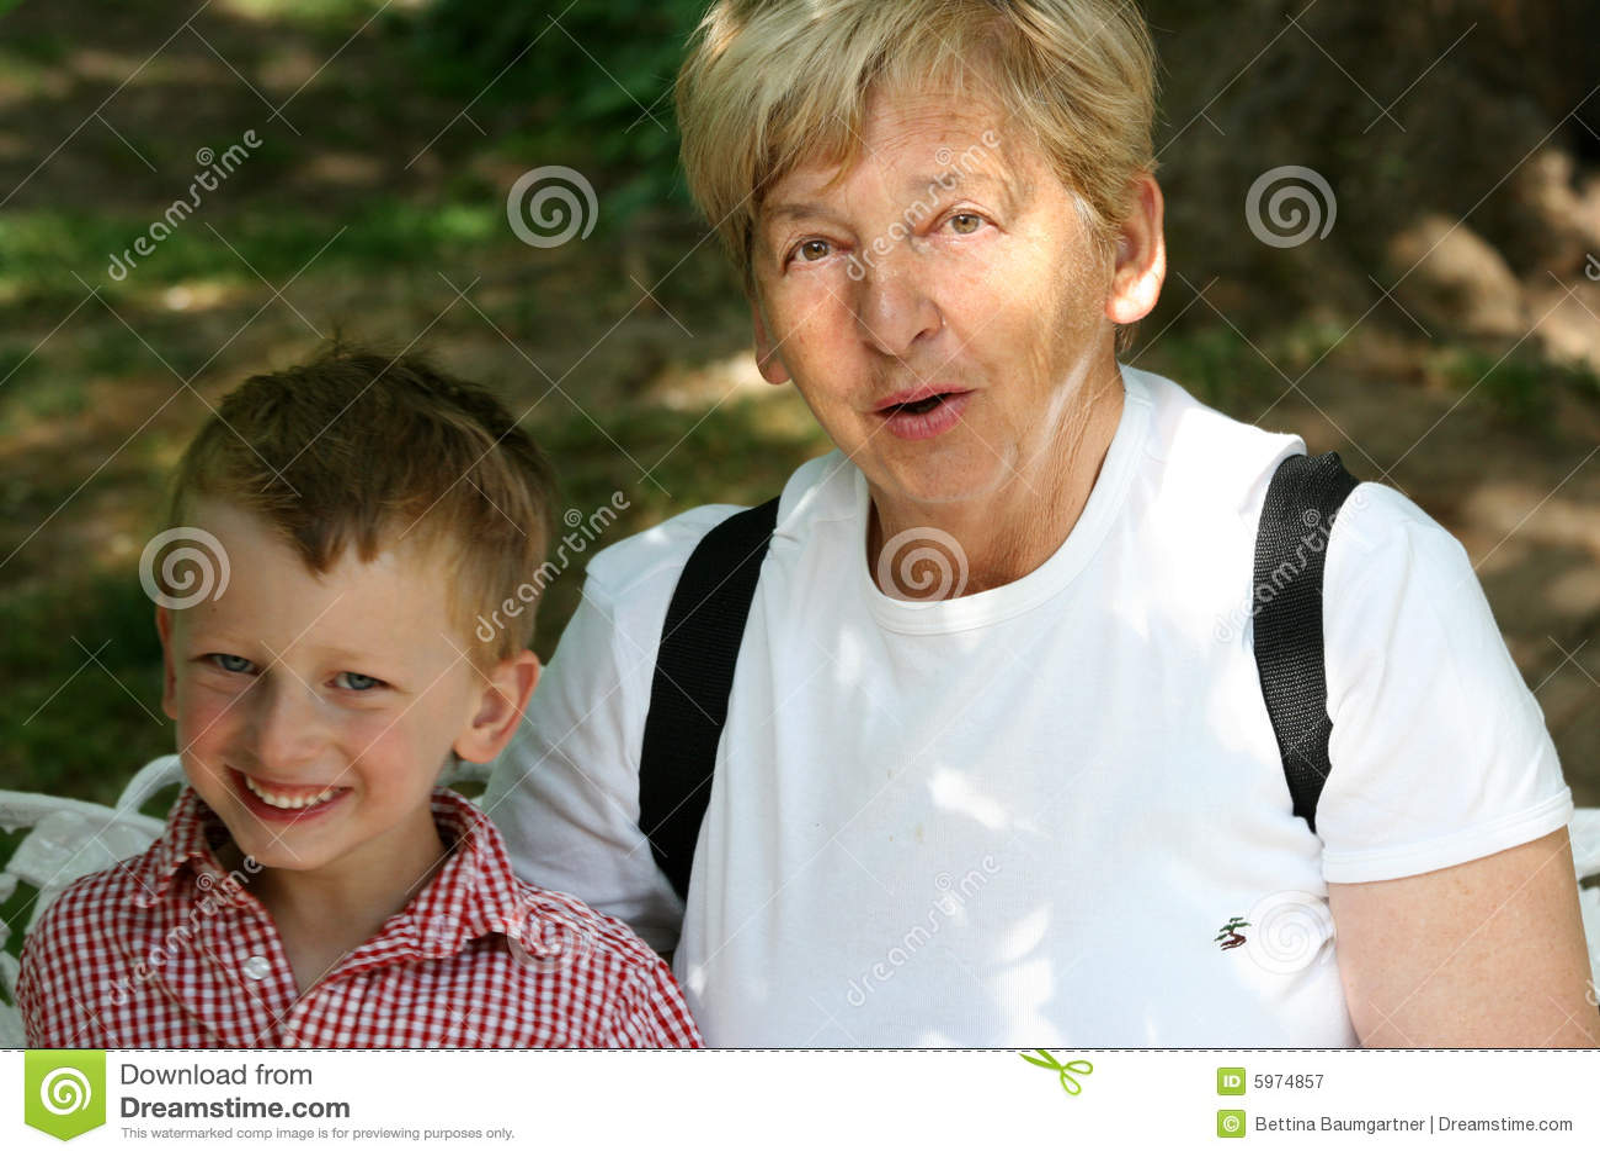 grandmother grandson short incest stories